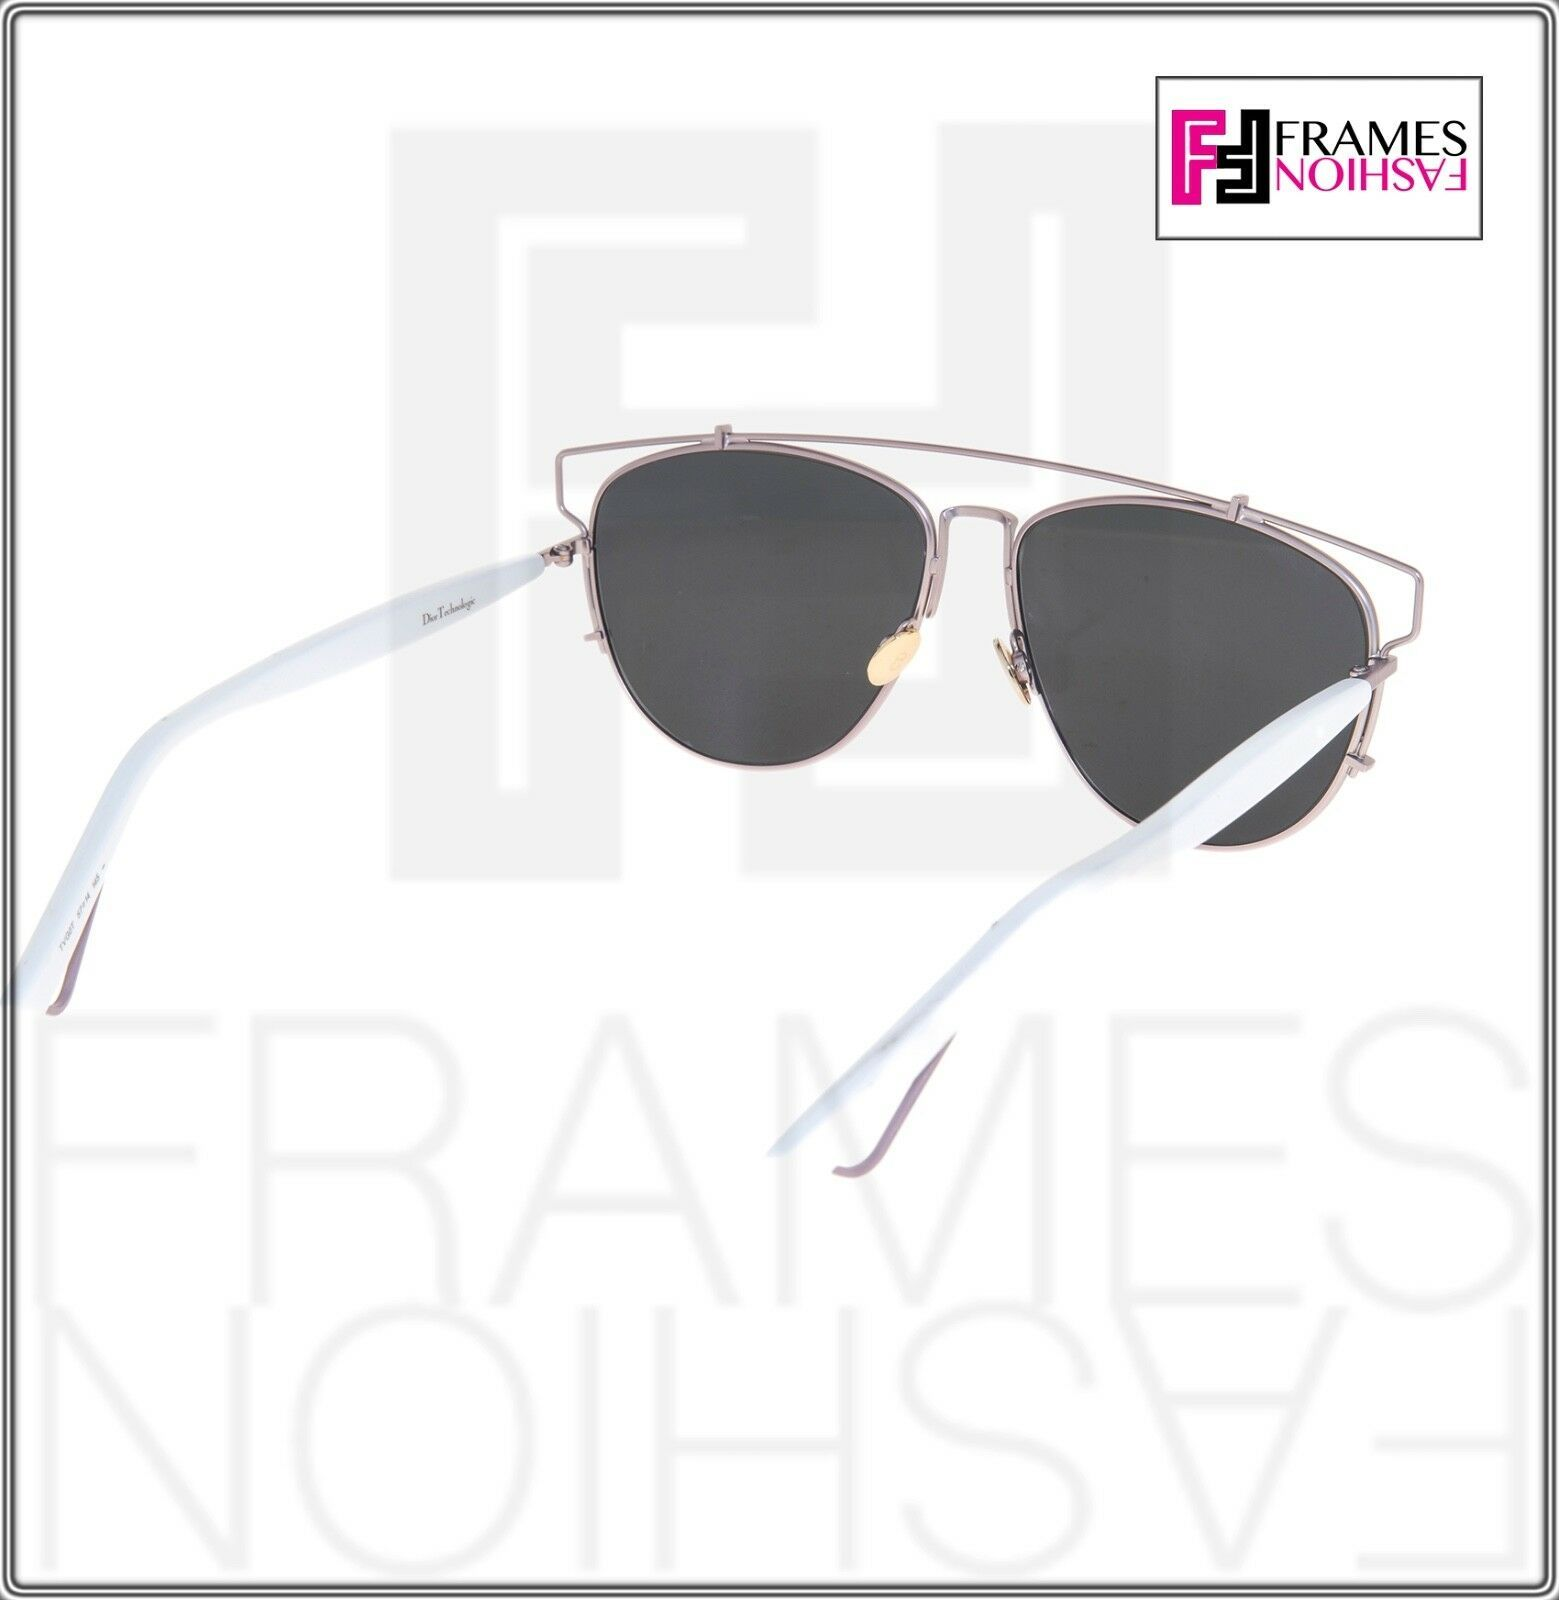 CHRISTIAN DIOR TECHNOLOGIC White Lilac Flash Mirrored Sunglasses DIORTECHNOLOGIC image 4